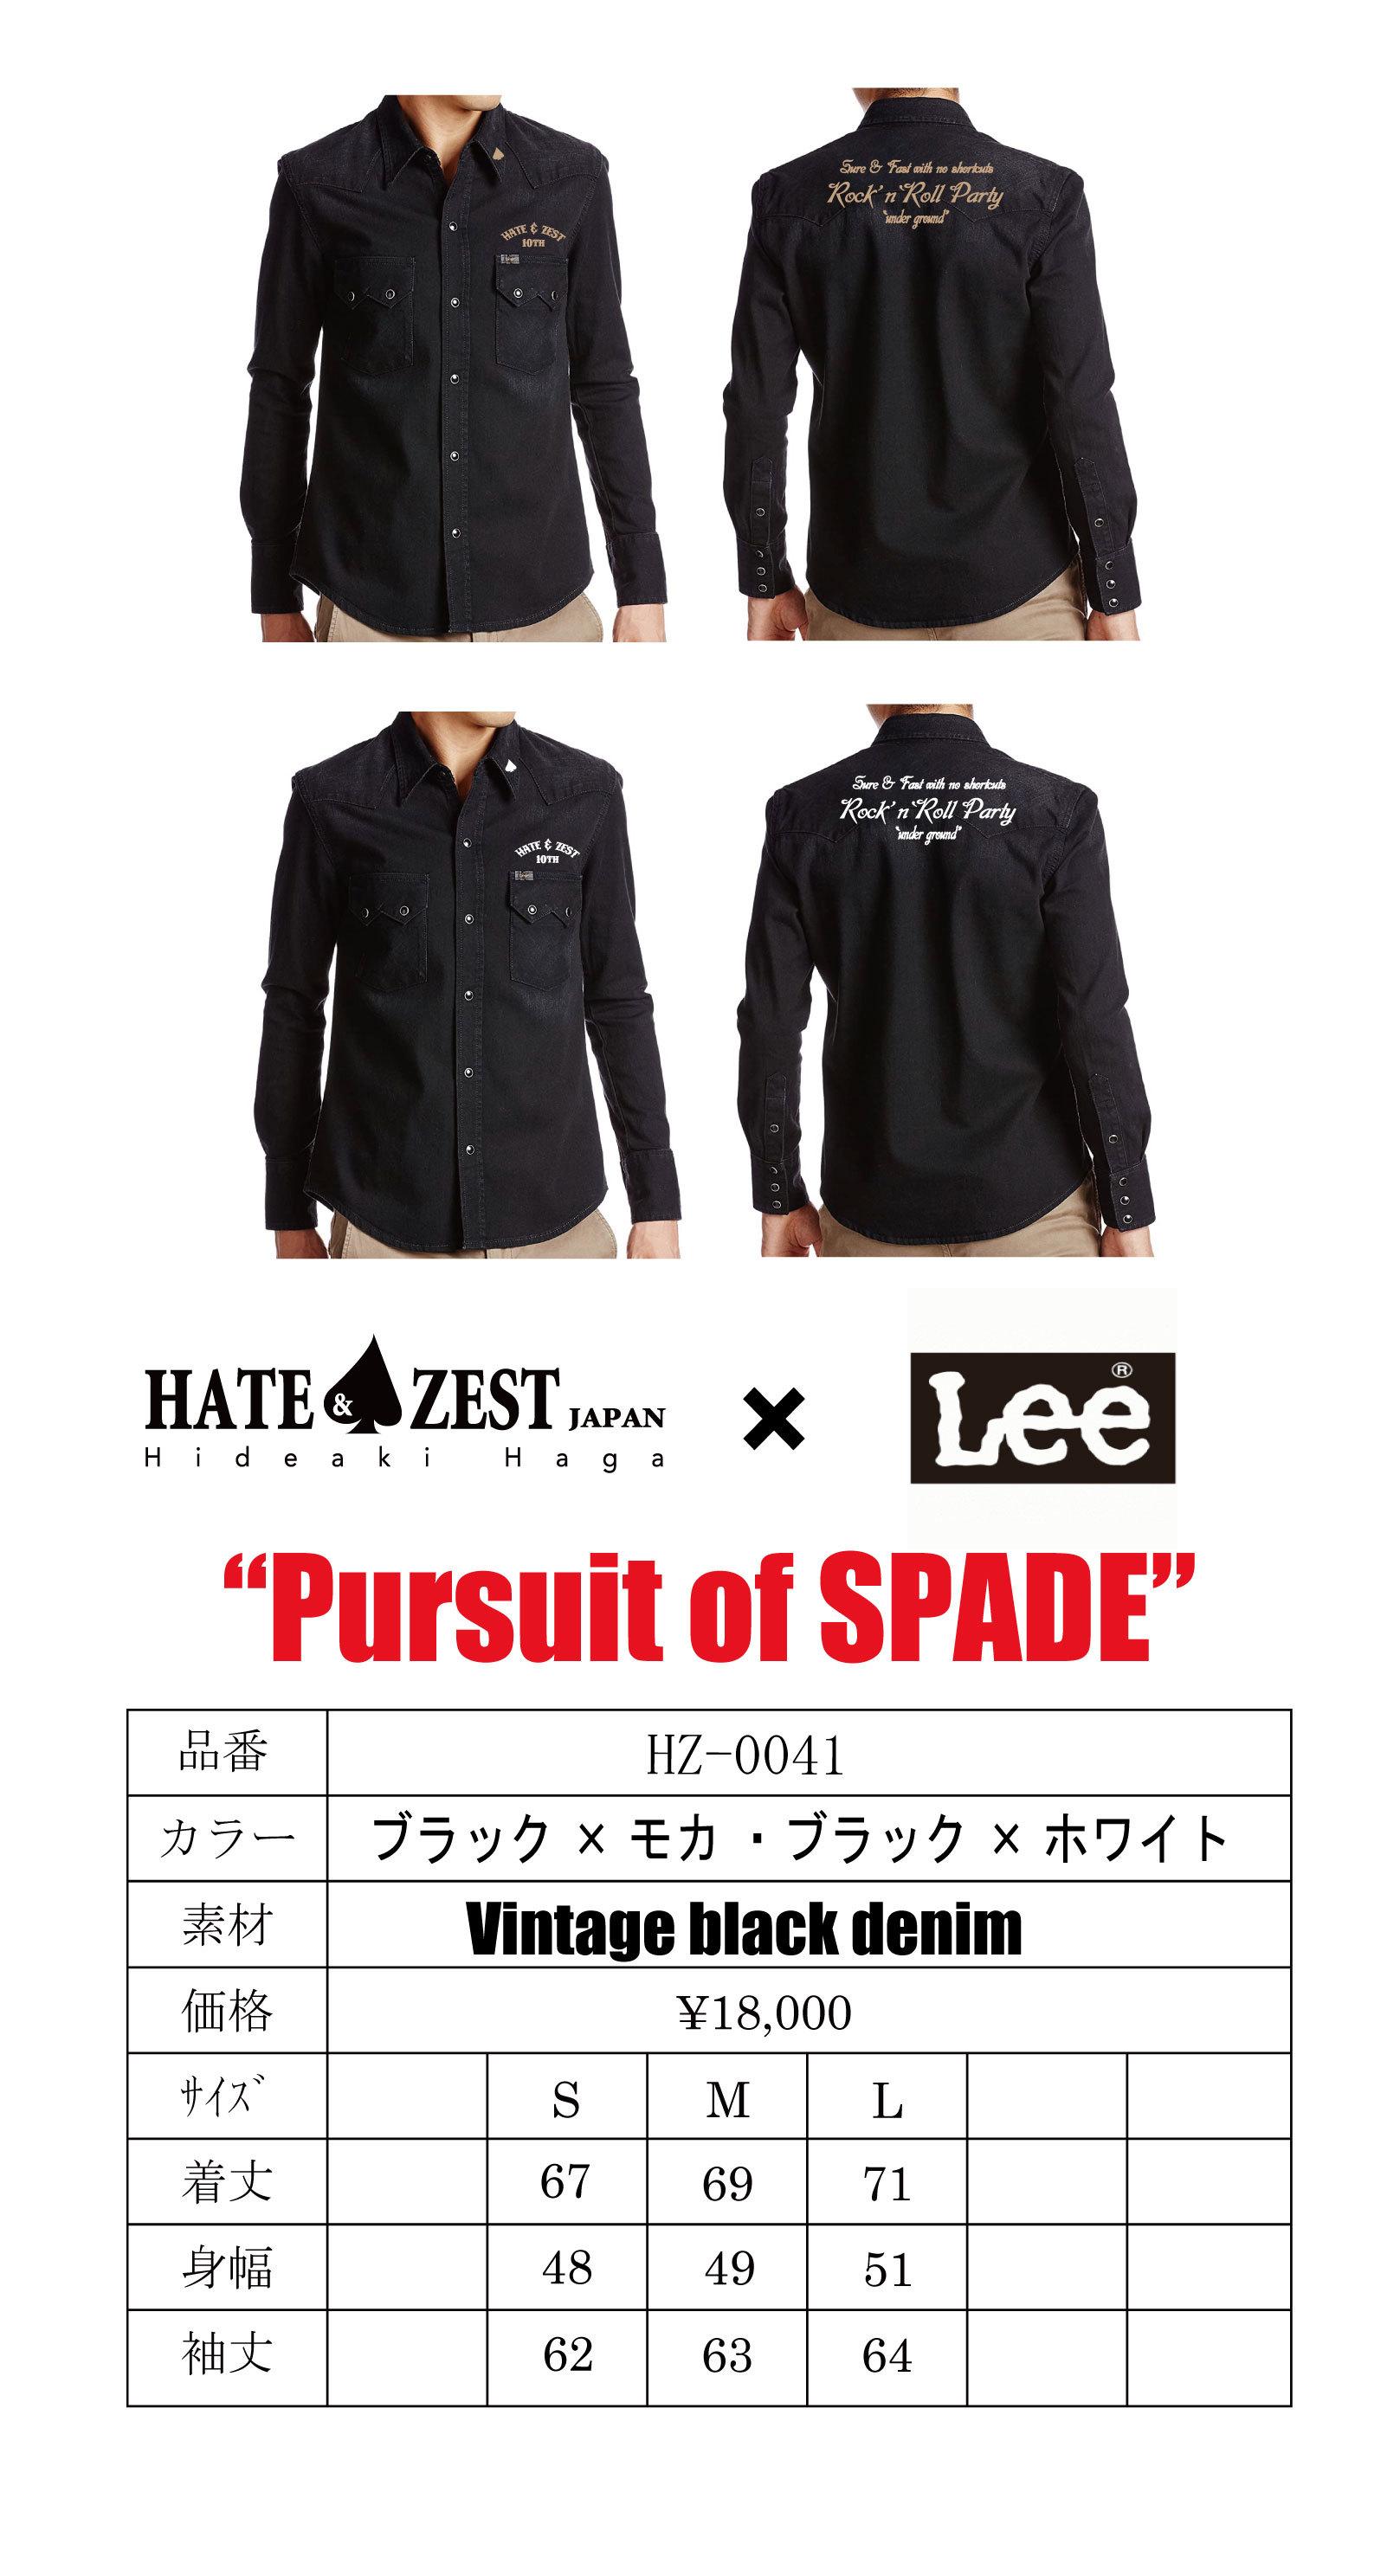 HATE&ZEST 10th Anniversary 第二弾 詳細_b0335651_14584583.jpg